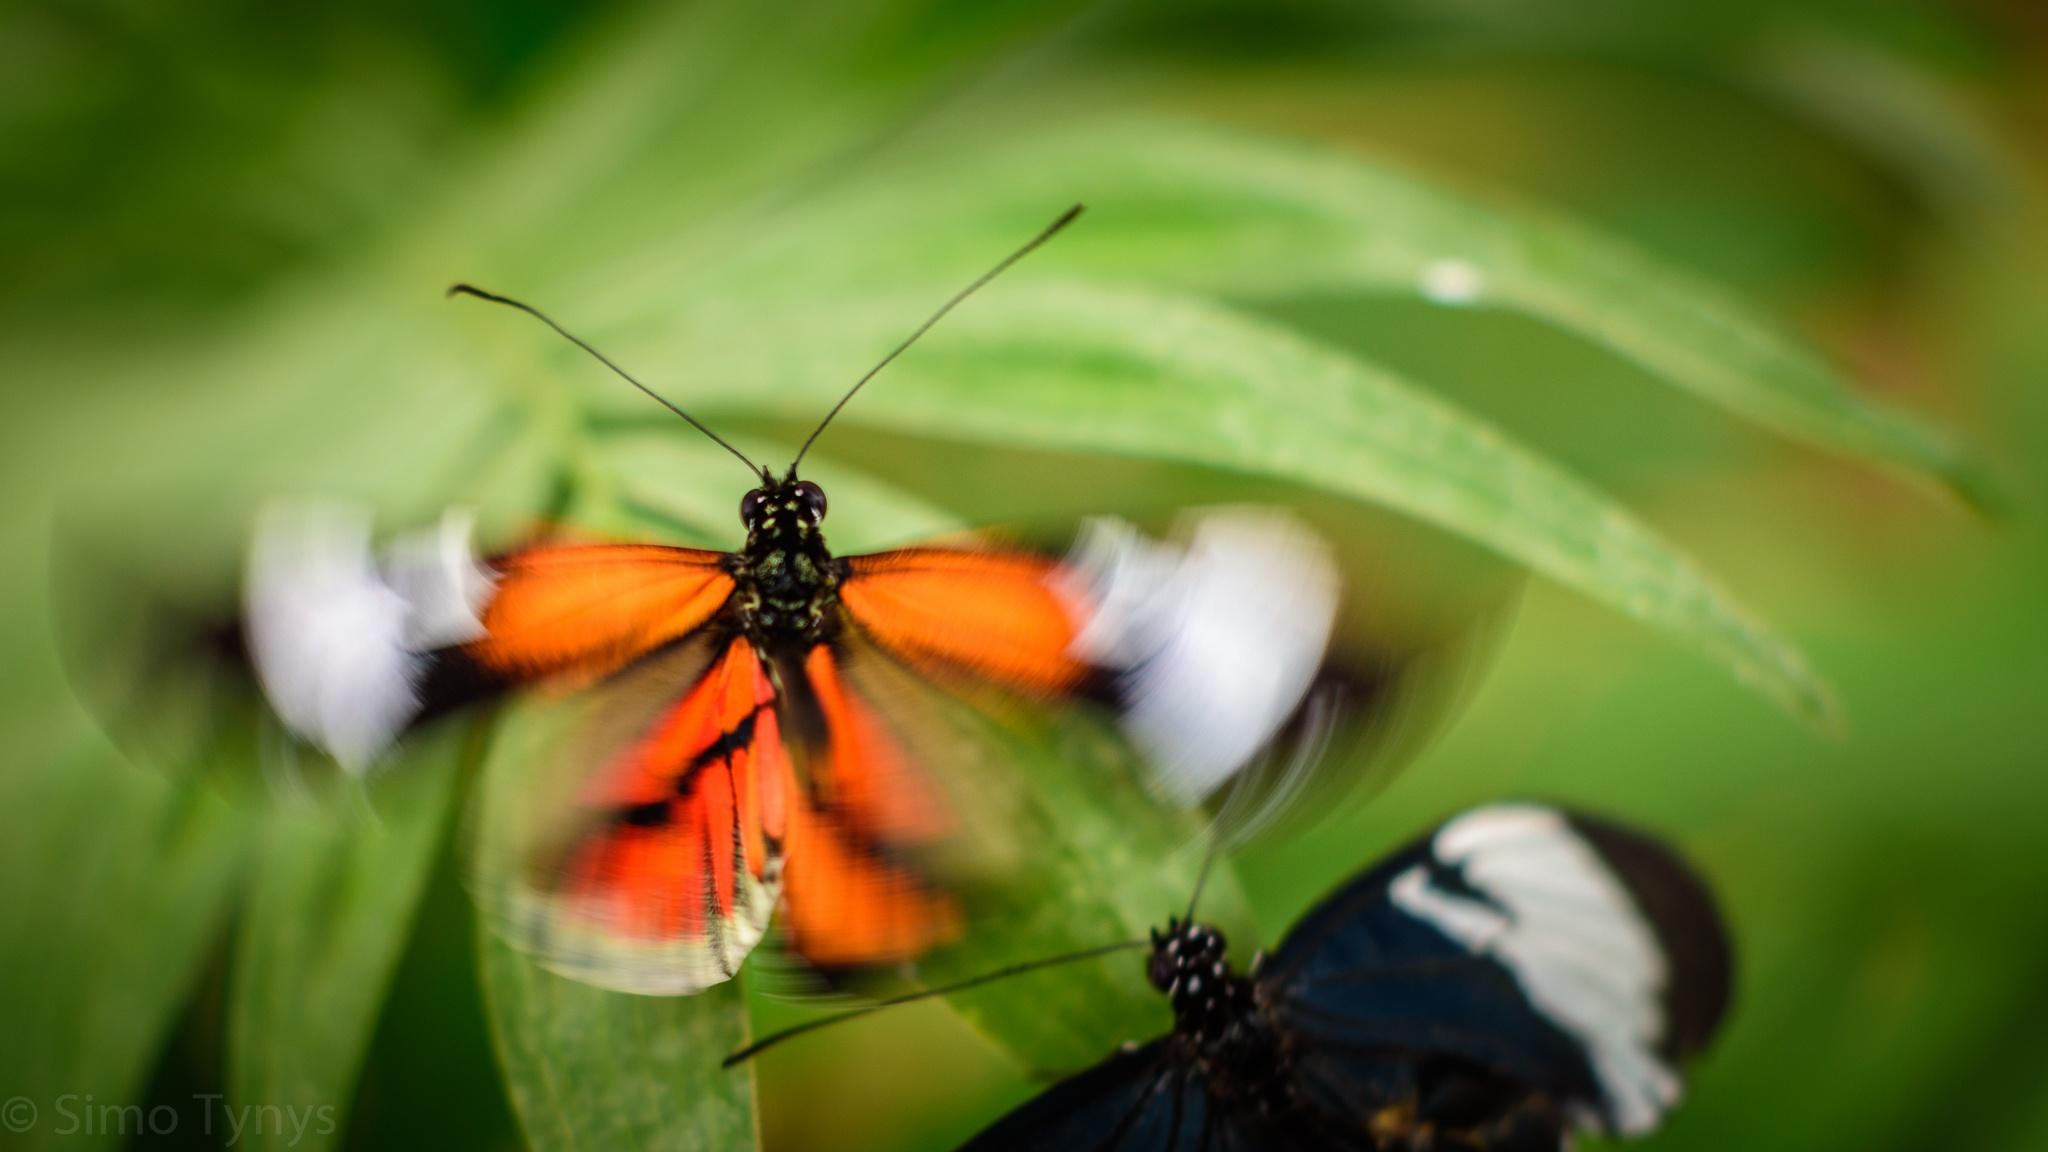 Butterflyaway by Simo Tynys